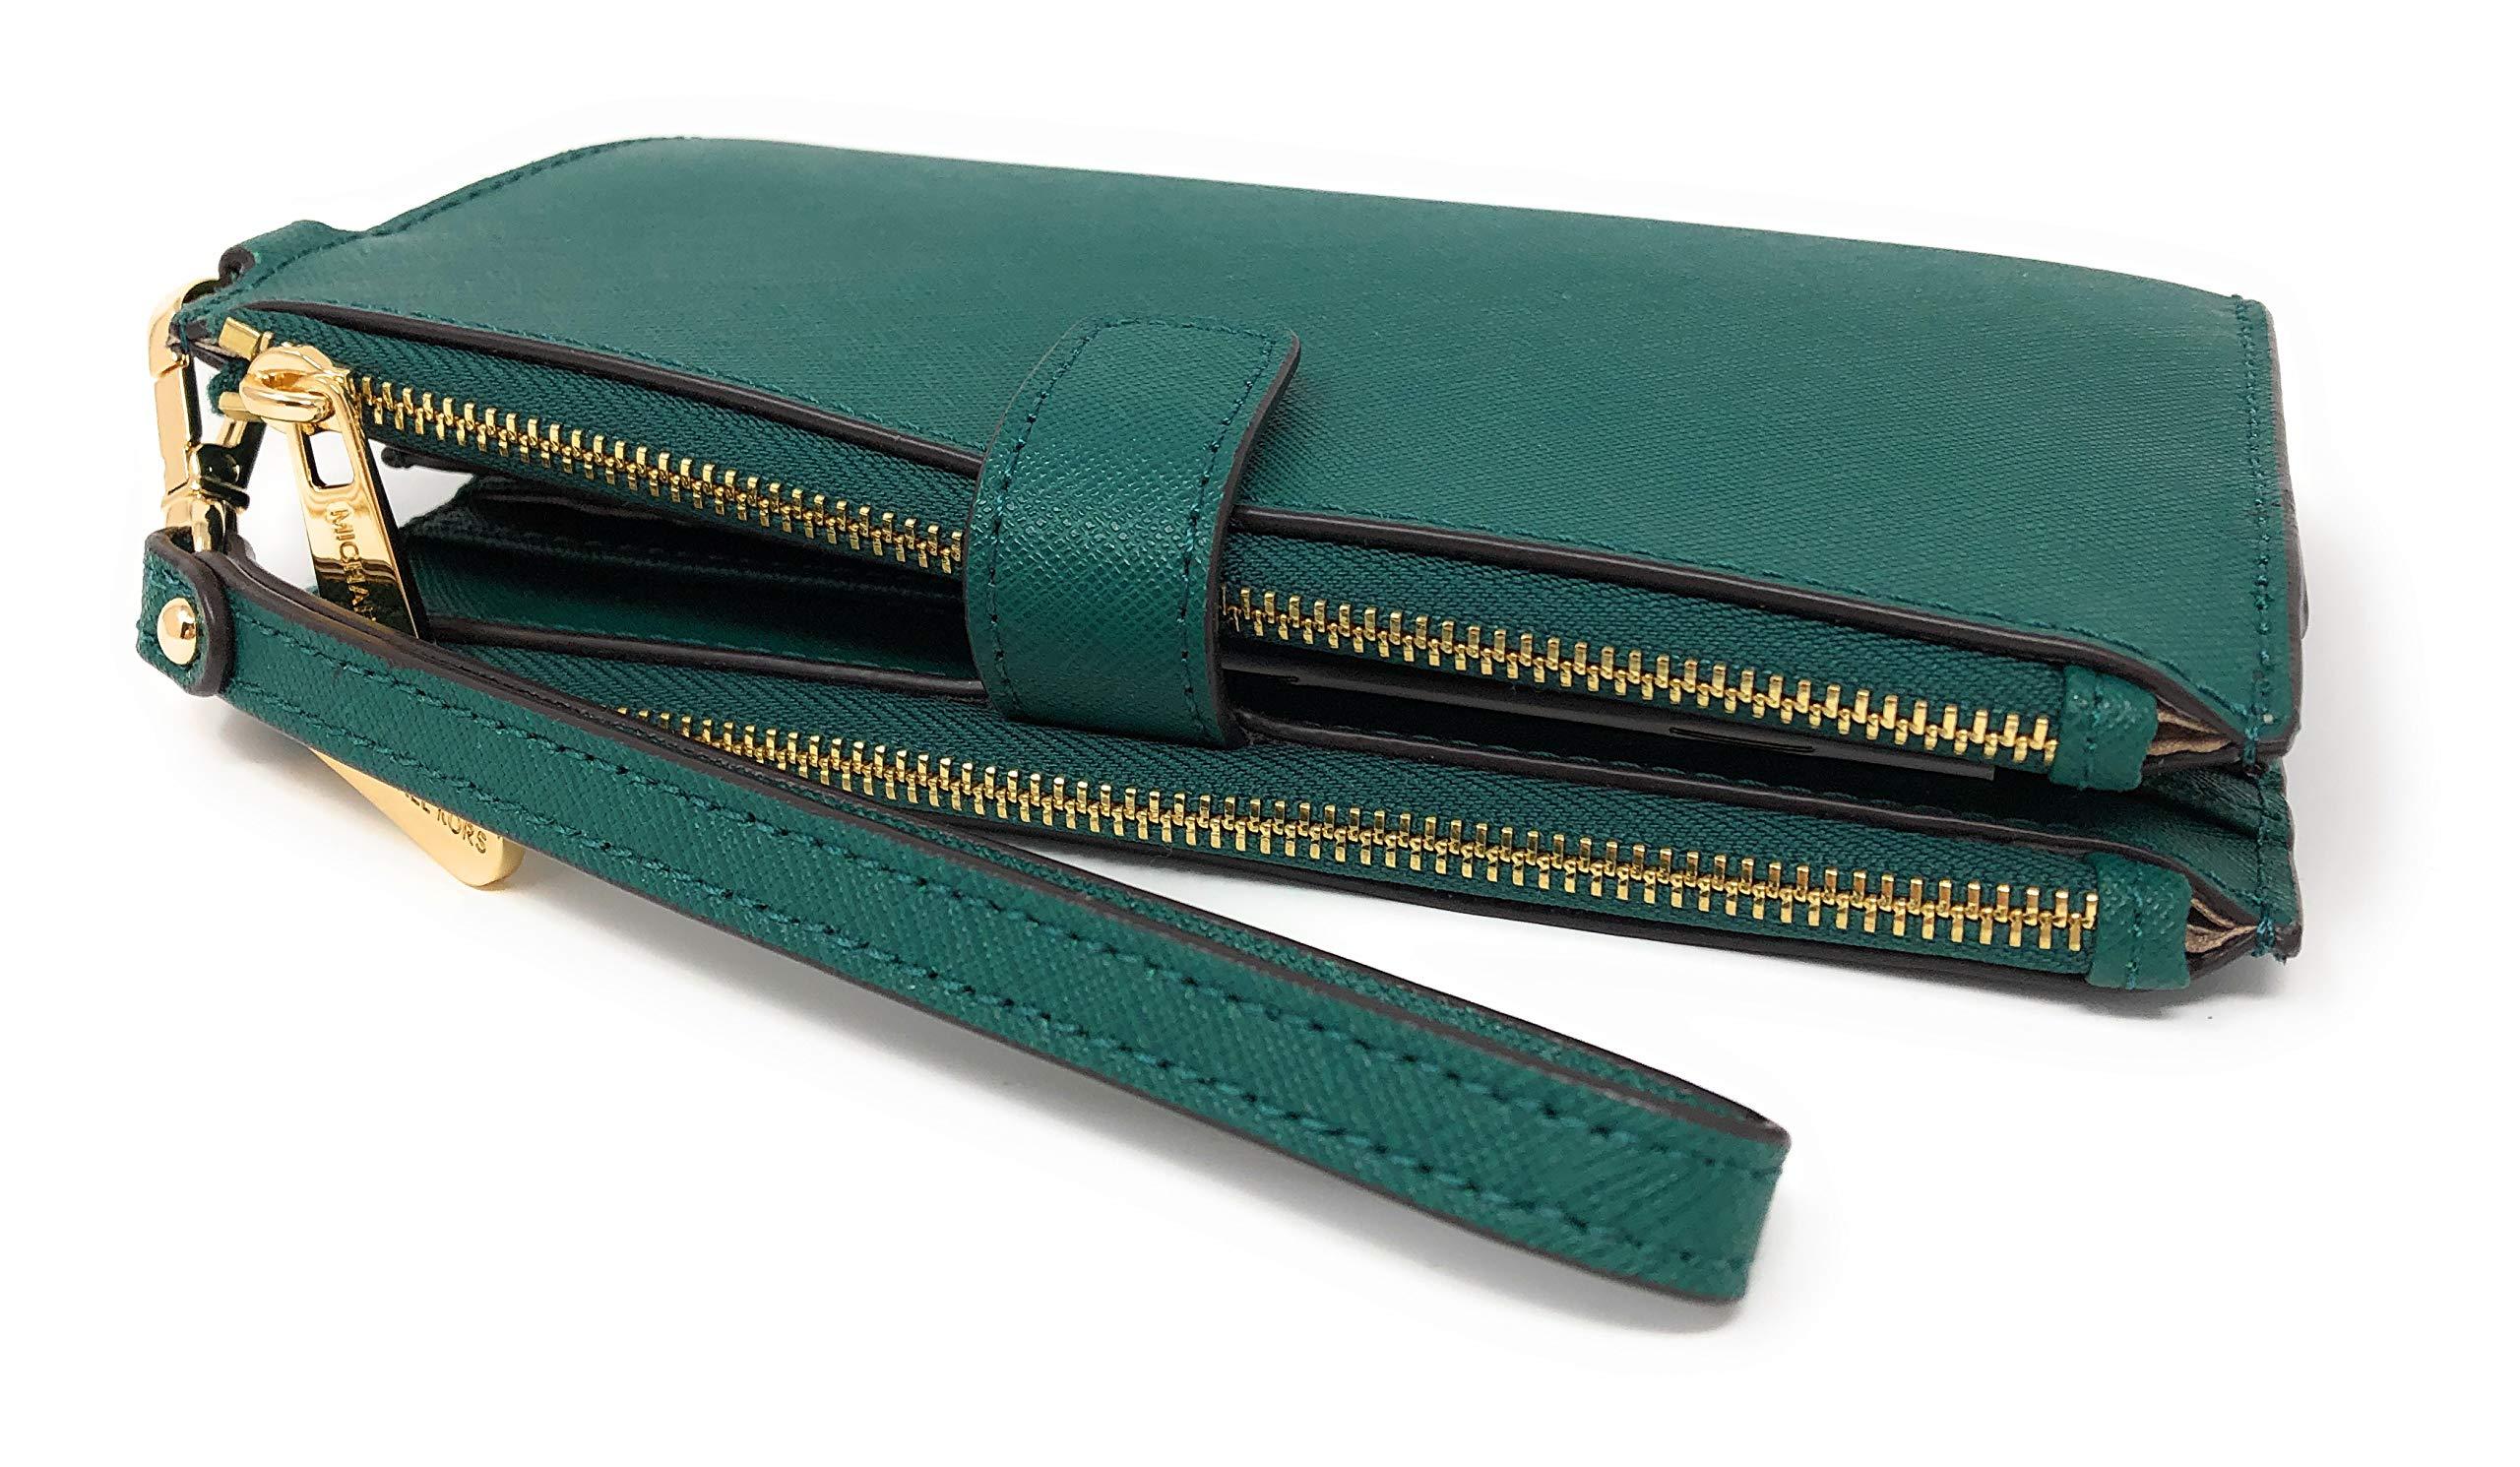 Michael Kors Jet Set Travel Double Zip Saffiano Leather Wristlet Wallet in Emerald by Michael Kors (Image #3)